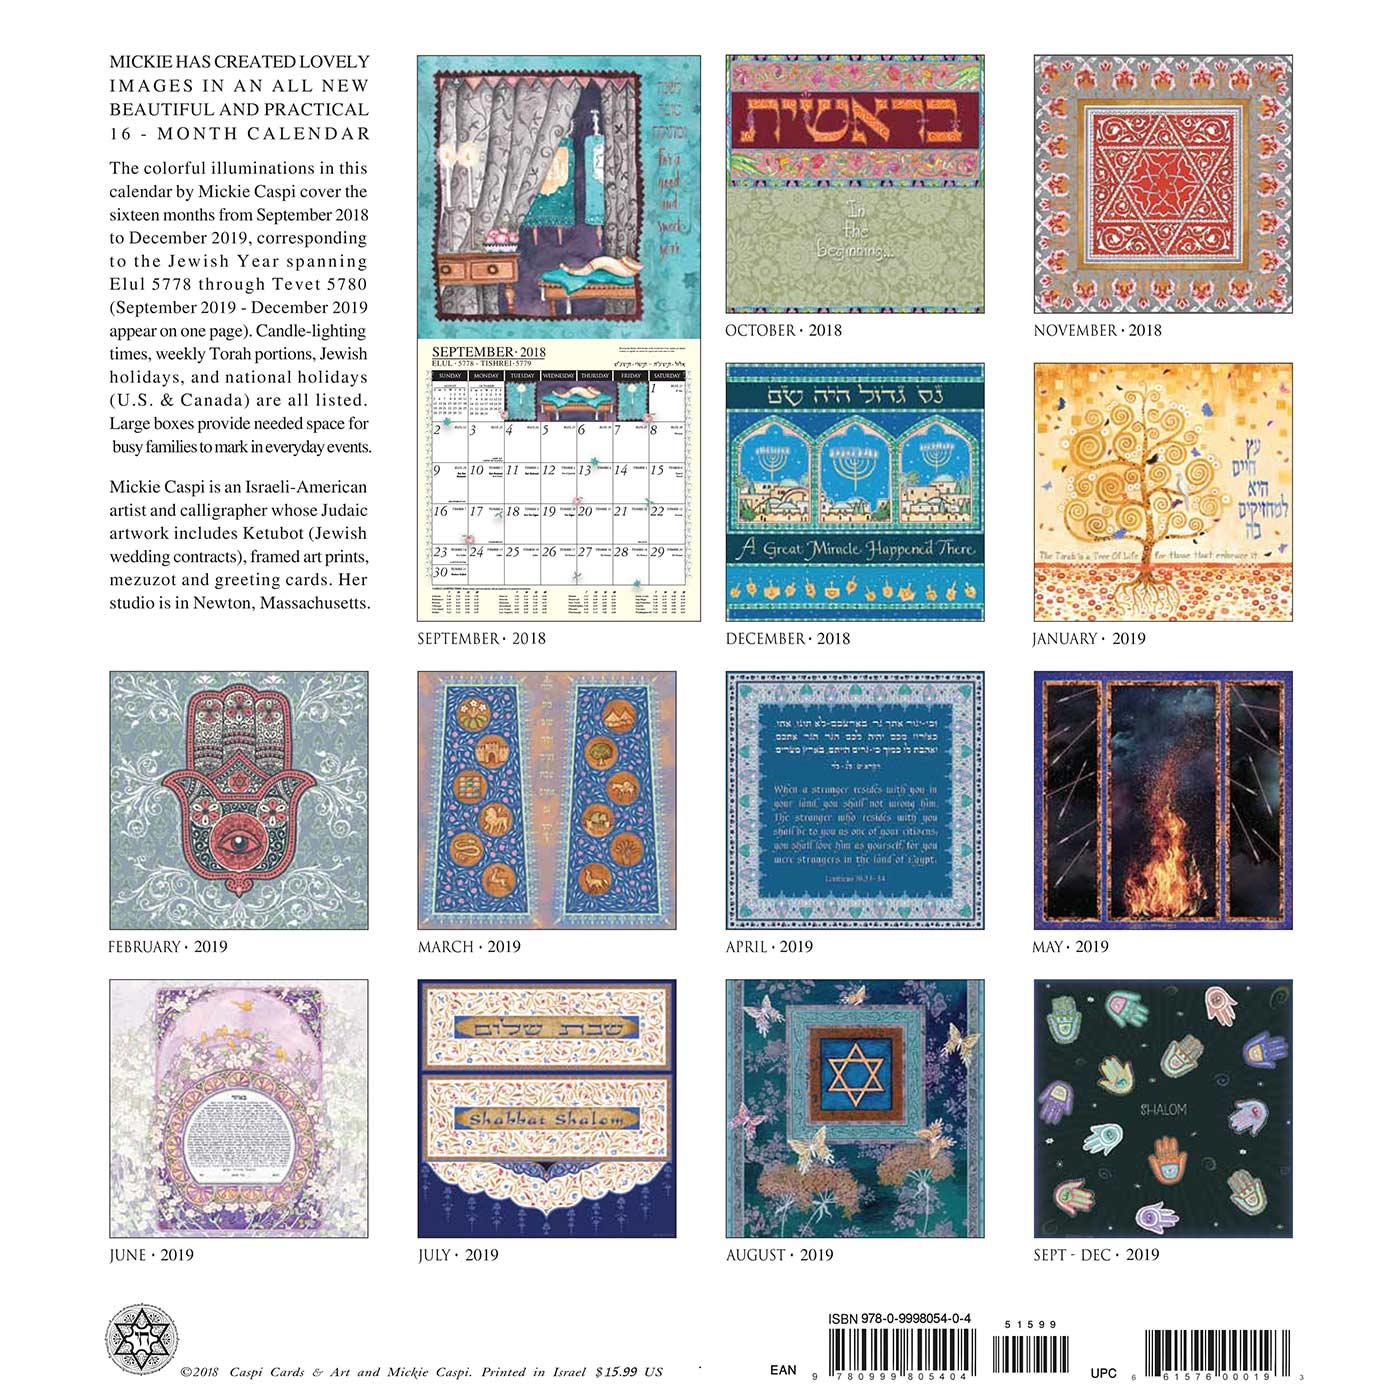 Jewish Art Calendar 2019 by Mickie Caspi Back Cover